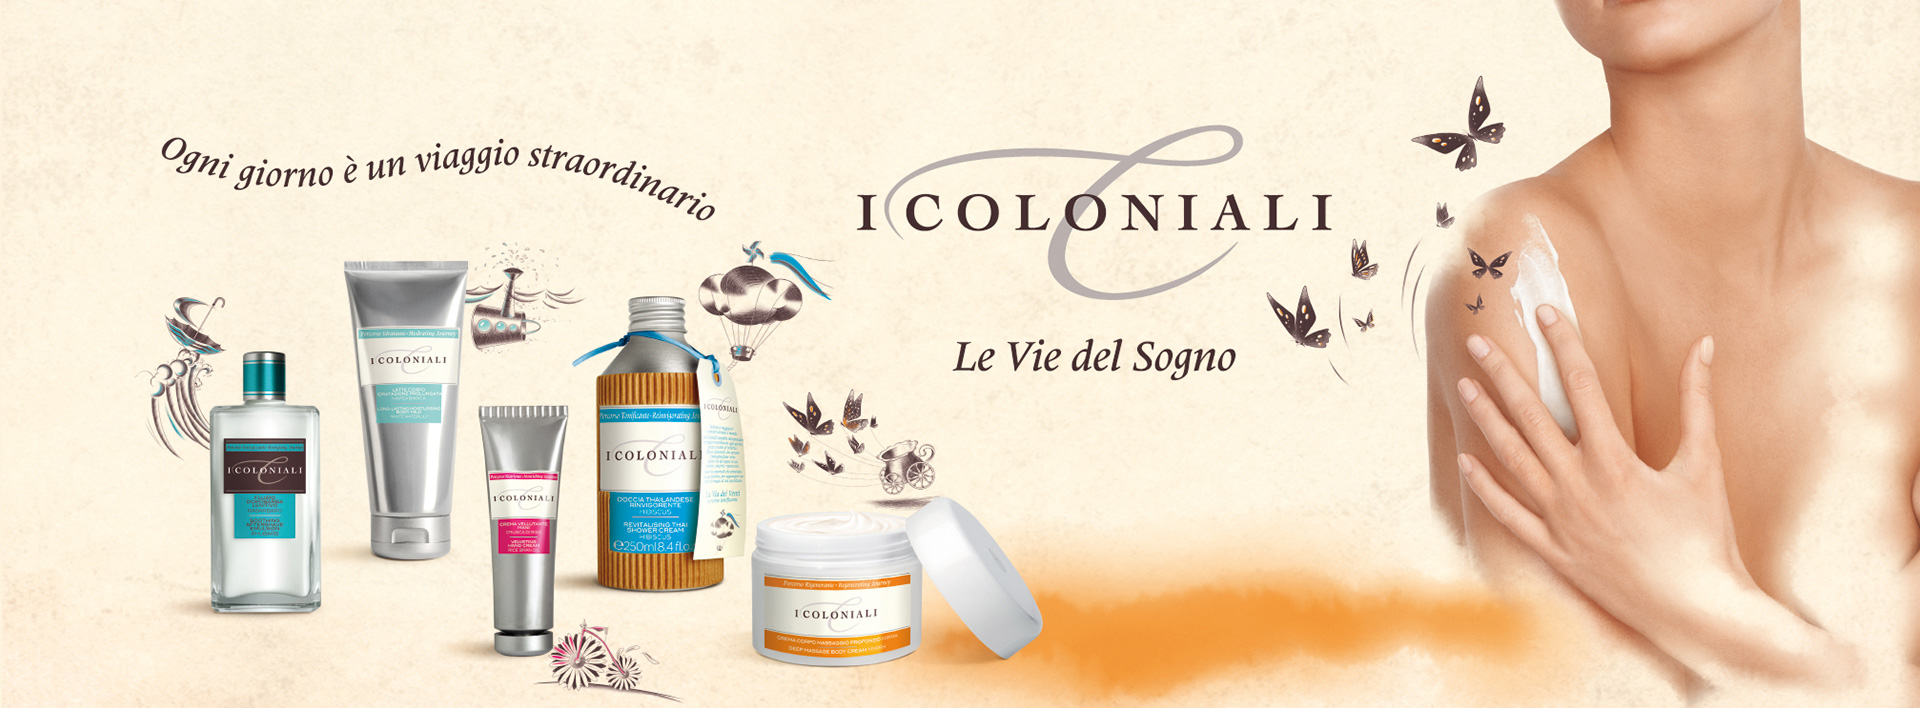 I Coloniali